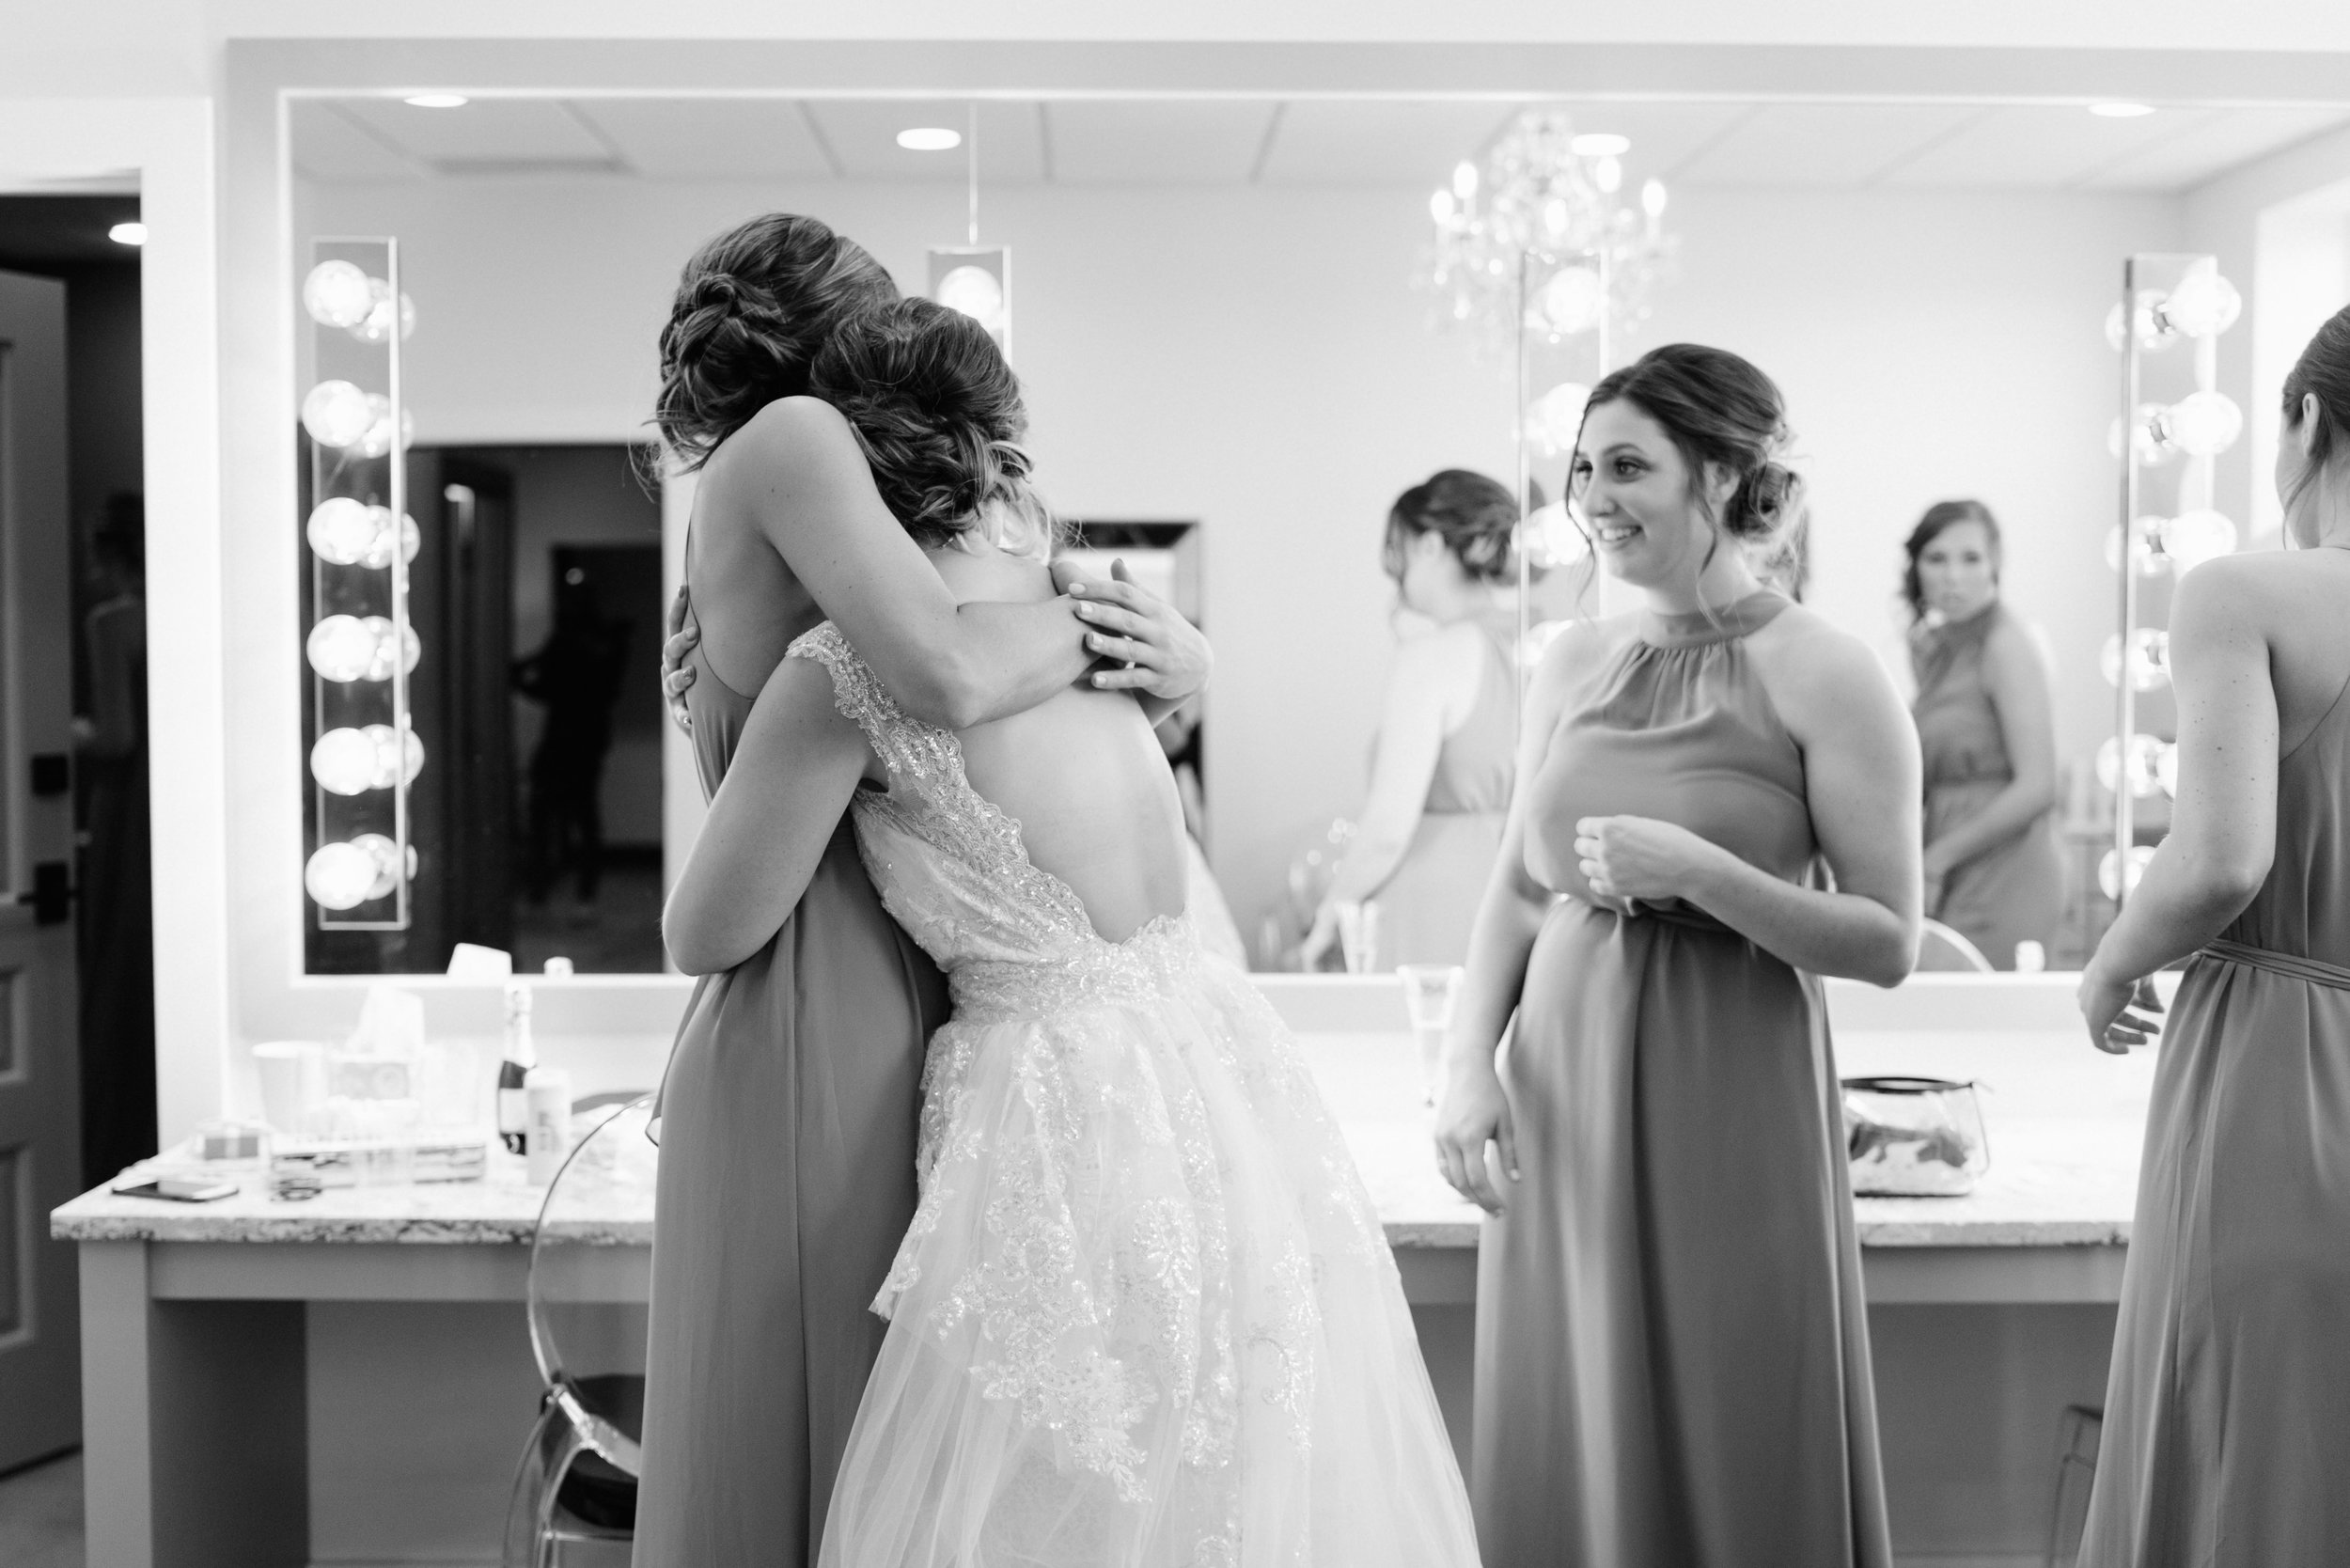 Carlee-Bob-Indianapolis-Wedding-Blog-21.jpg